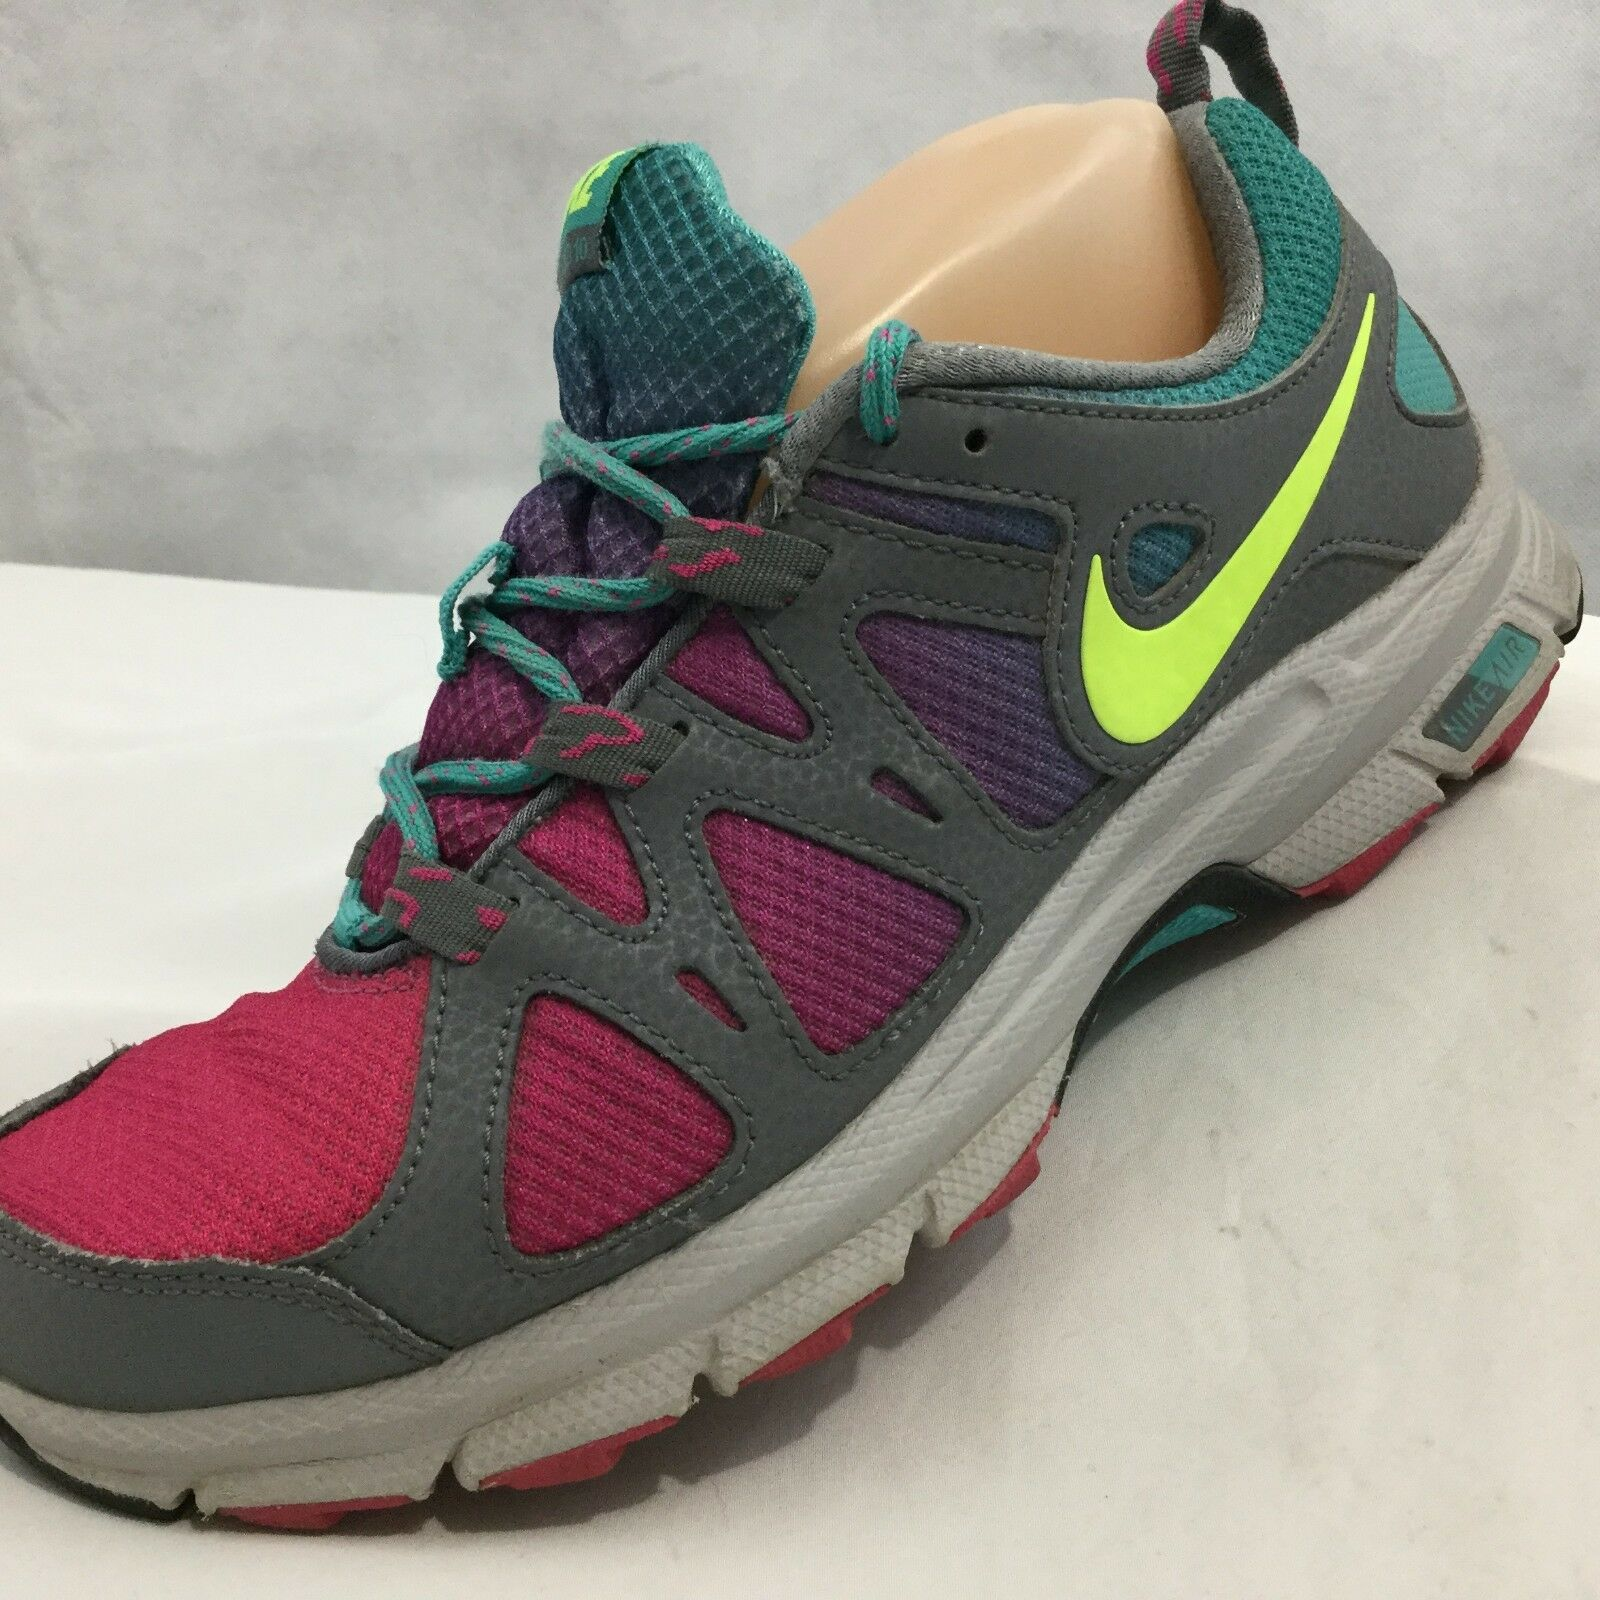 Seasonal price cuts, discount benefits Nike Air Alvord 10 Trail Running Sneakers Sz 8.5 Pink Gray Blue Hiking Walking